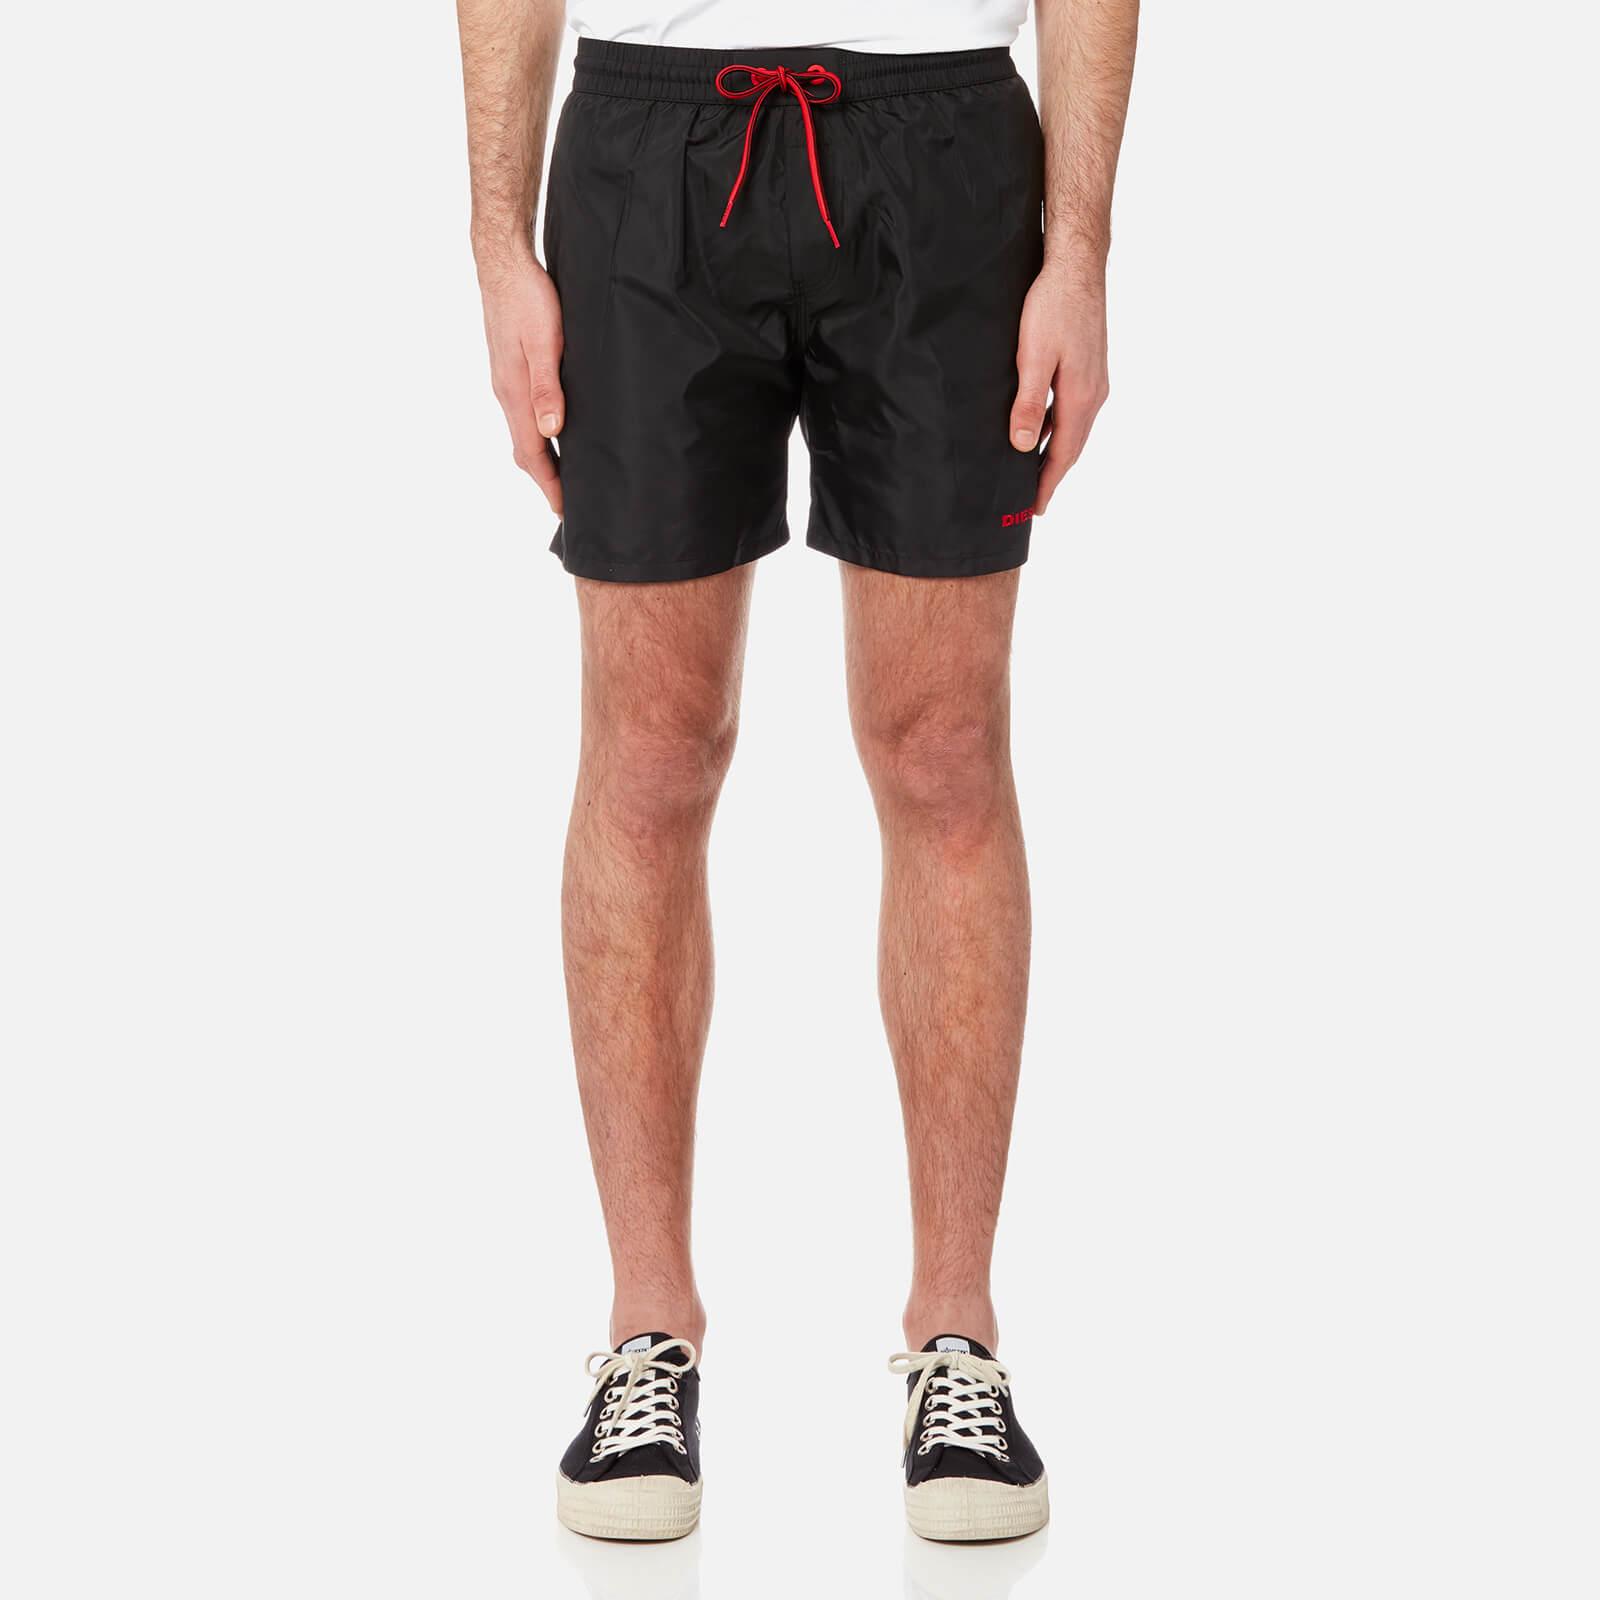 a5cfd47a9a Diesel Men's Wave Basic Swim Shorts - Black Mens Underwear | TheHut.com